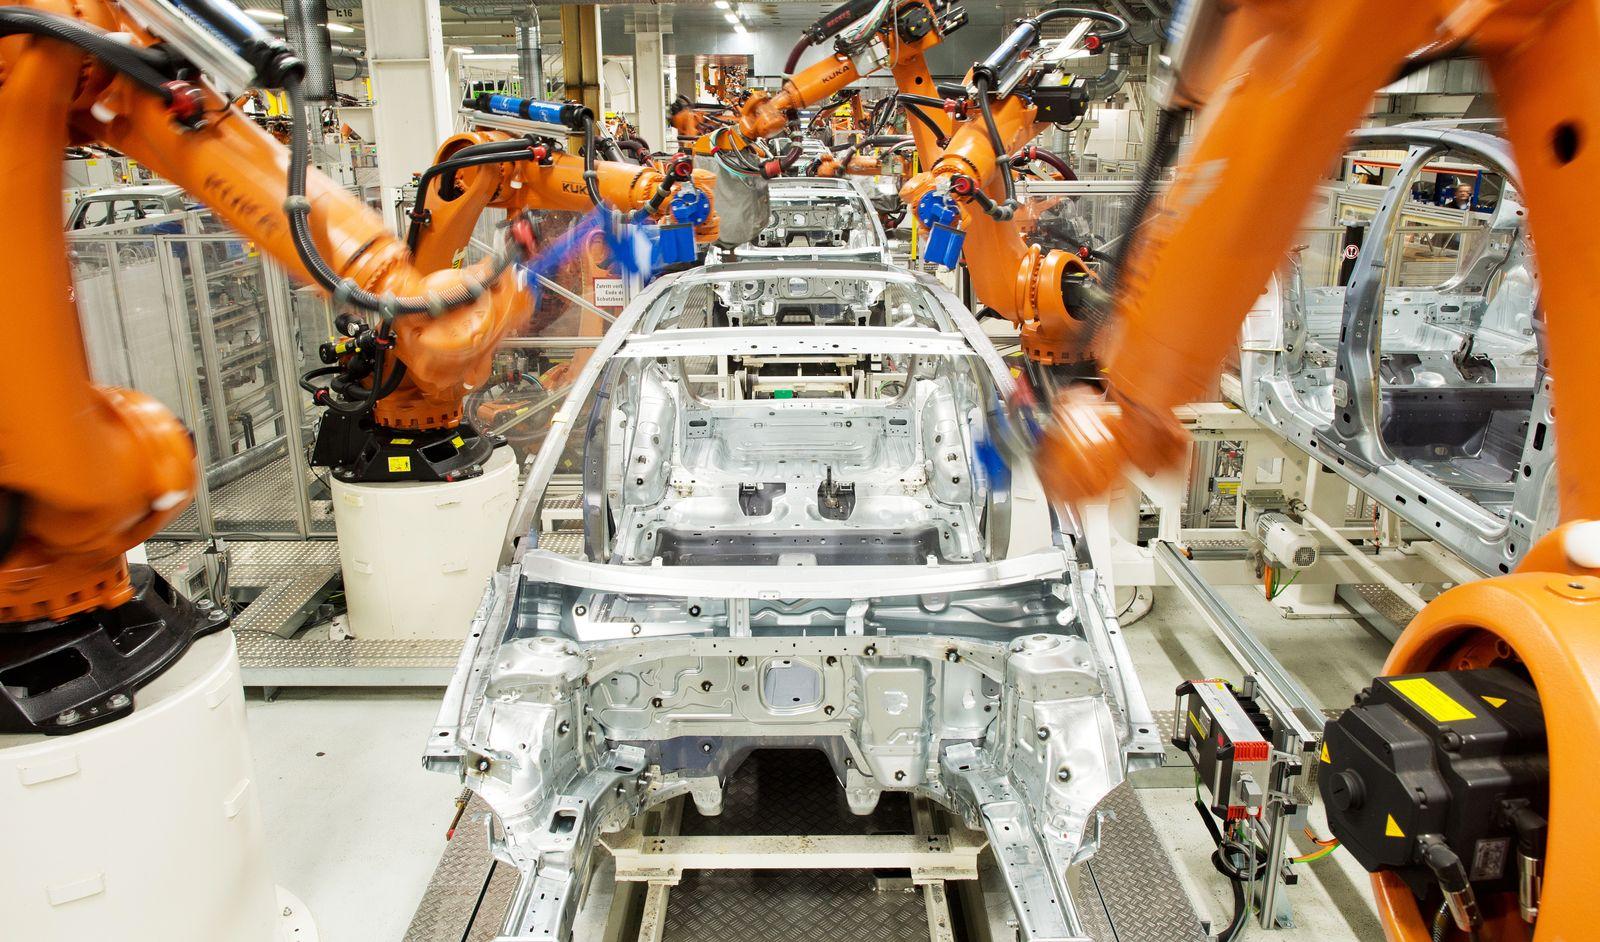 KUKA / Automatisierung Arbeitsplätze / Roboter